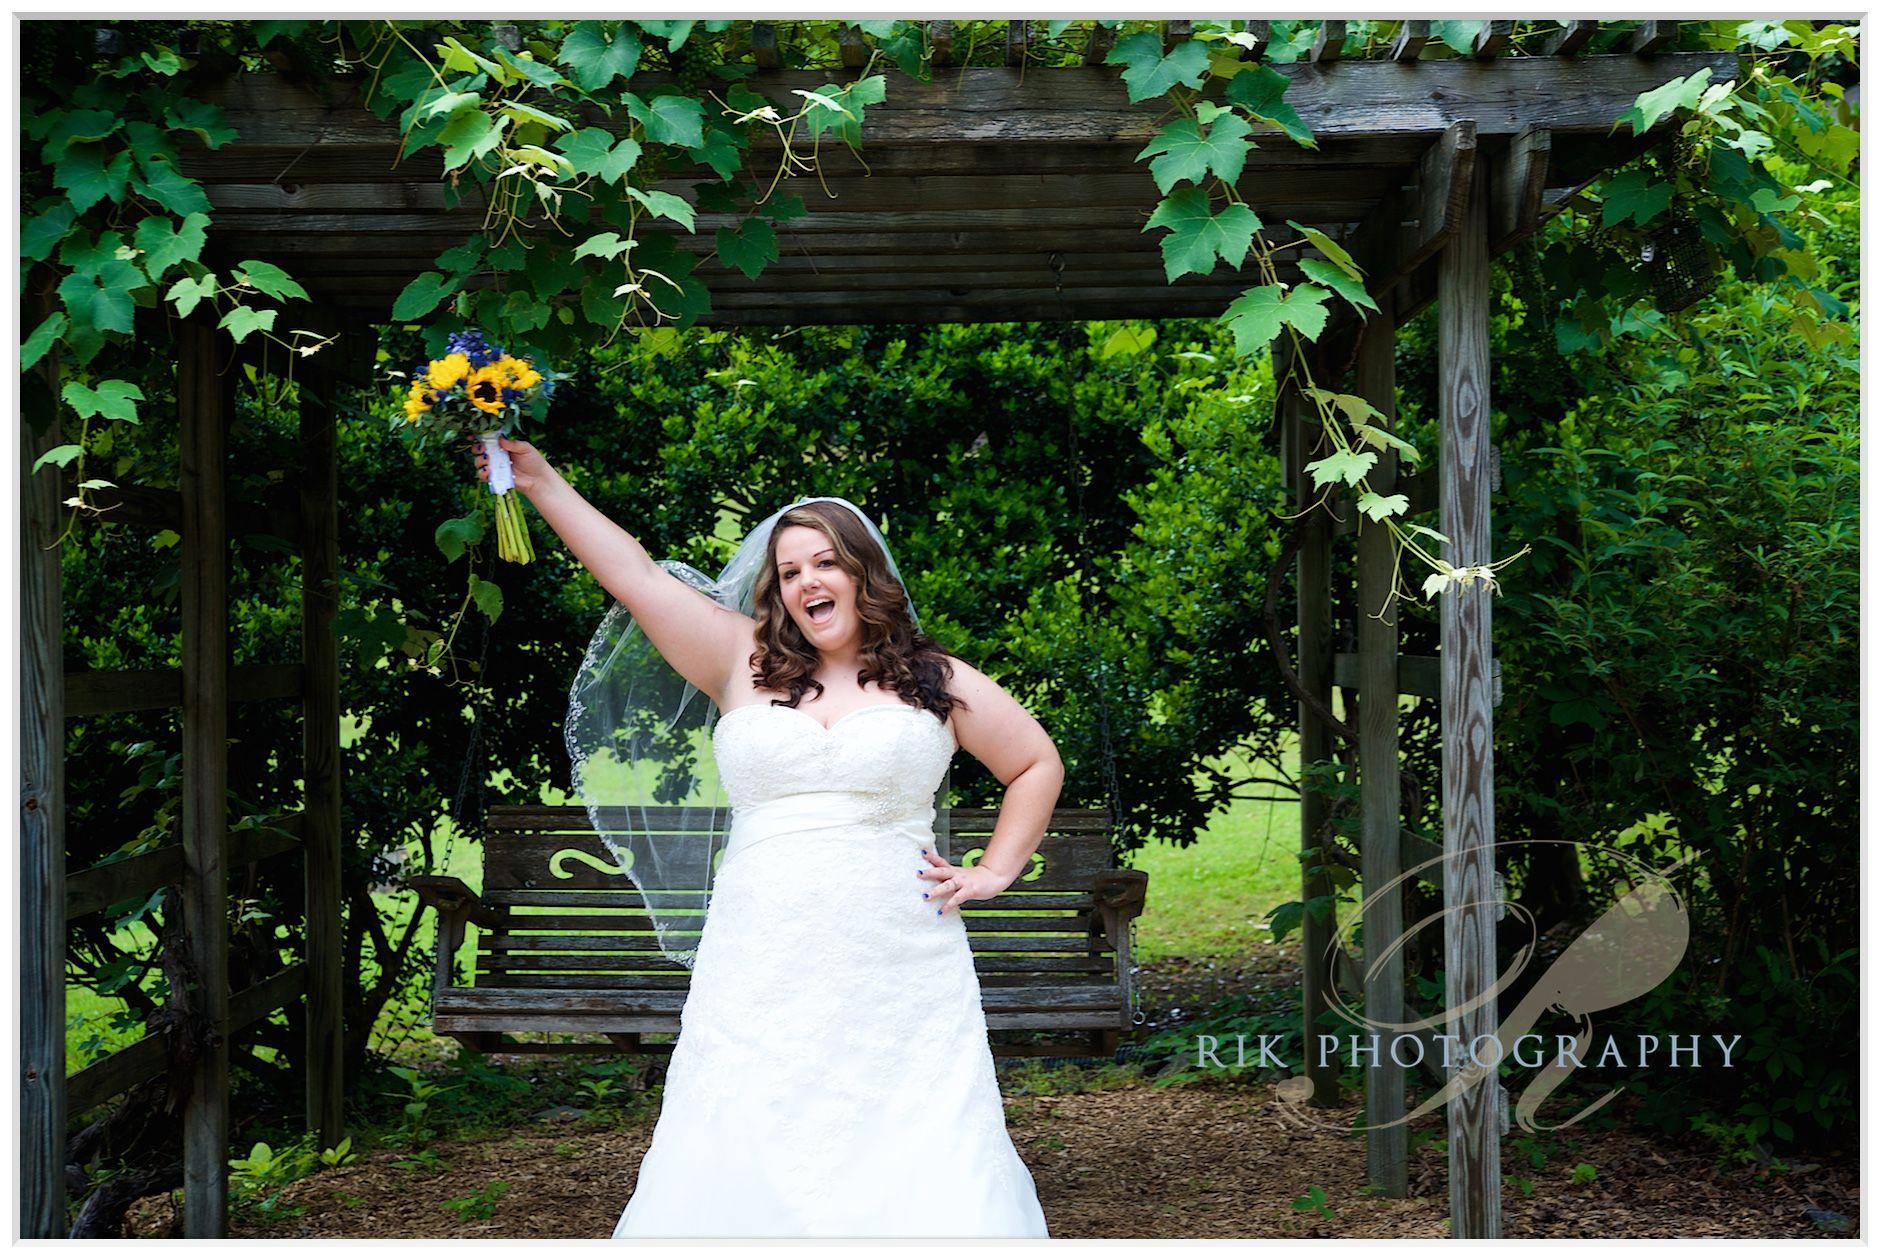 Grapevine arbor wedding dresses